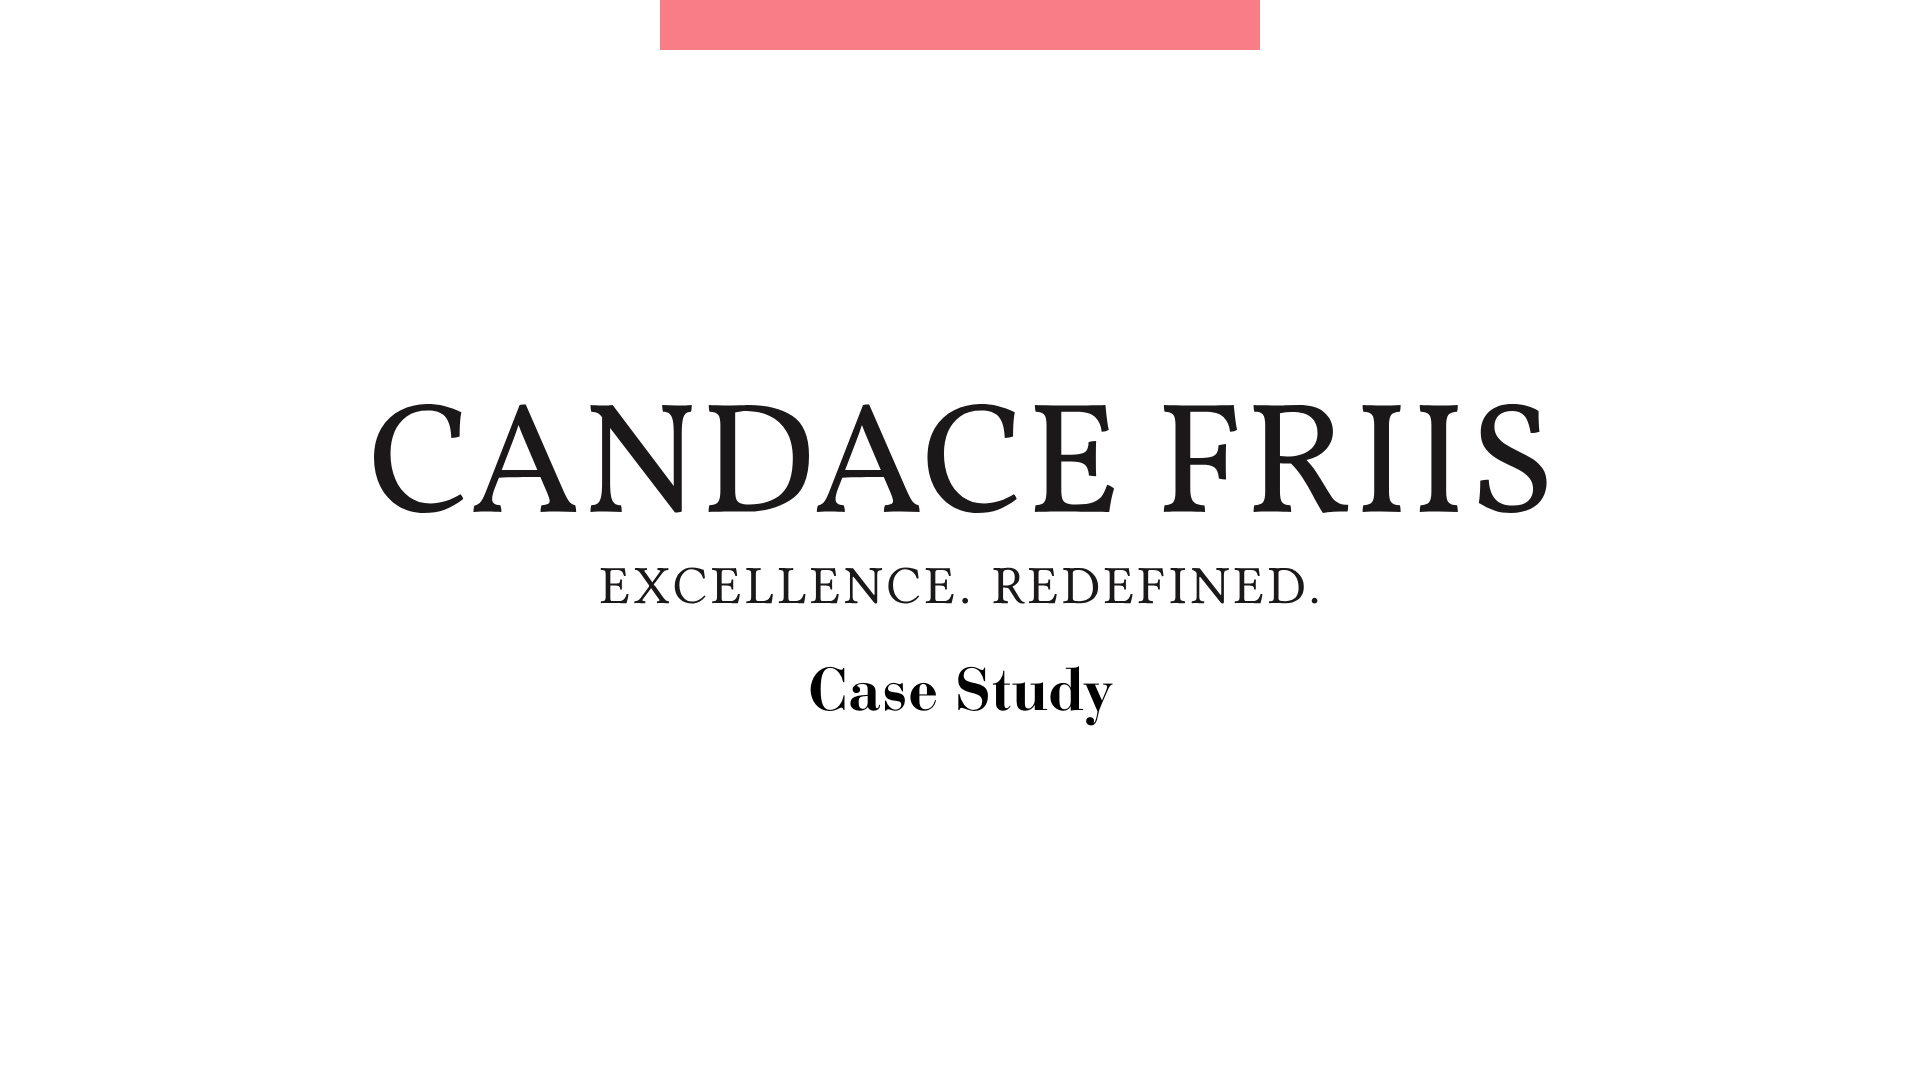 Candace_Header.jpg